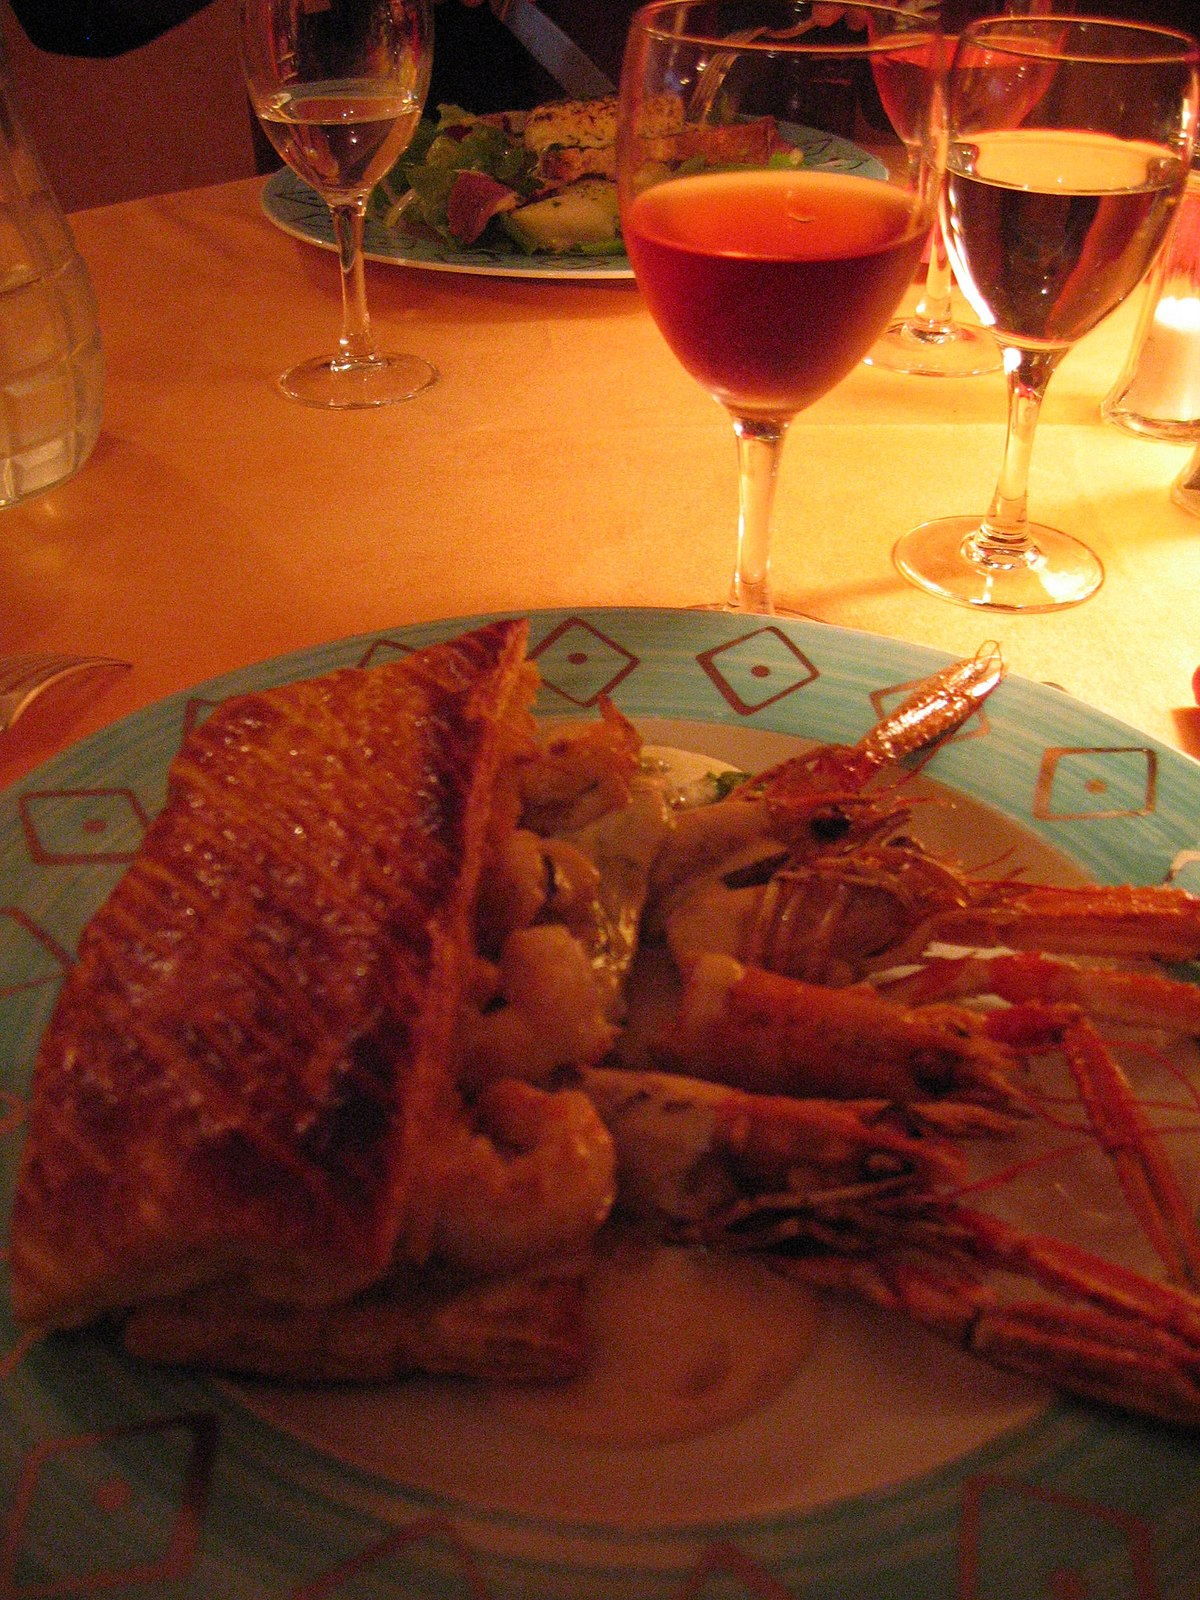 Restaurants Bordeaux Cuisine Y Ef Bf Bdm Ef Bf Bdnite